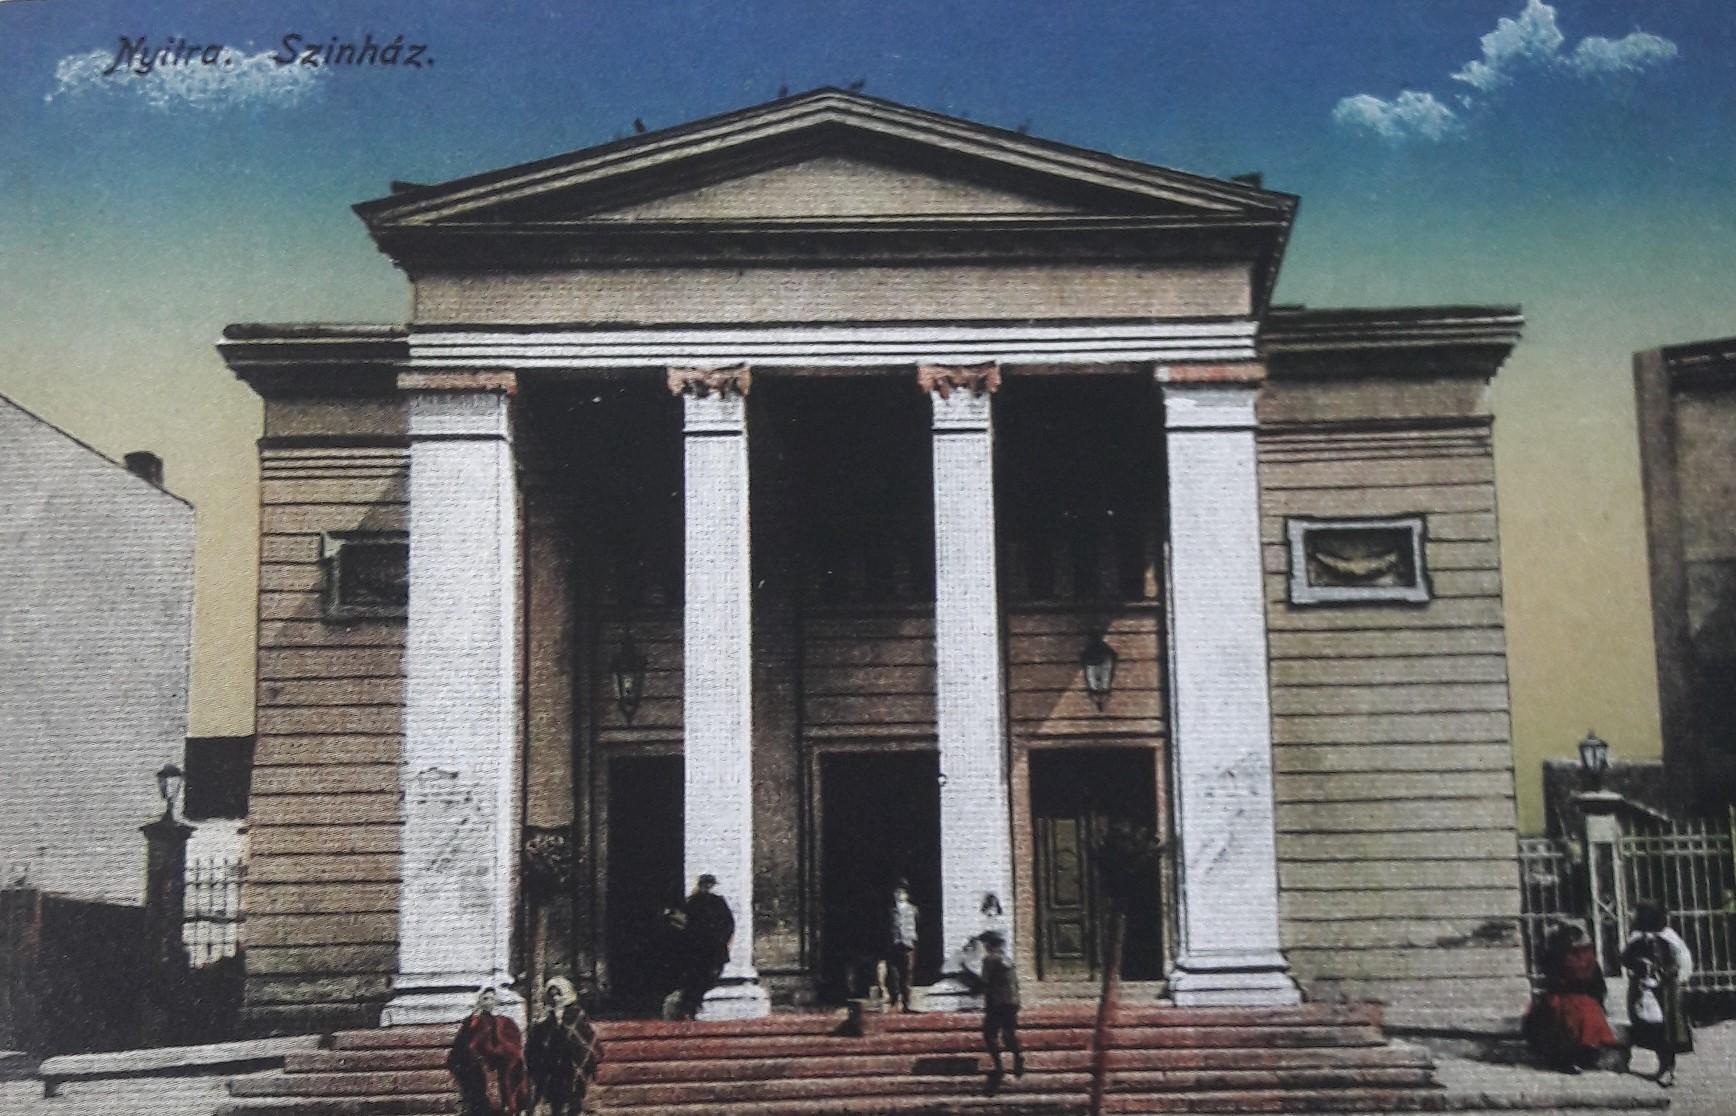 upné_divadlo_okolo_roku_1910